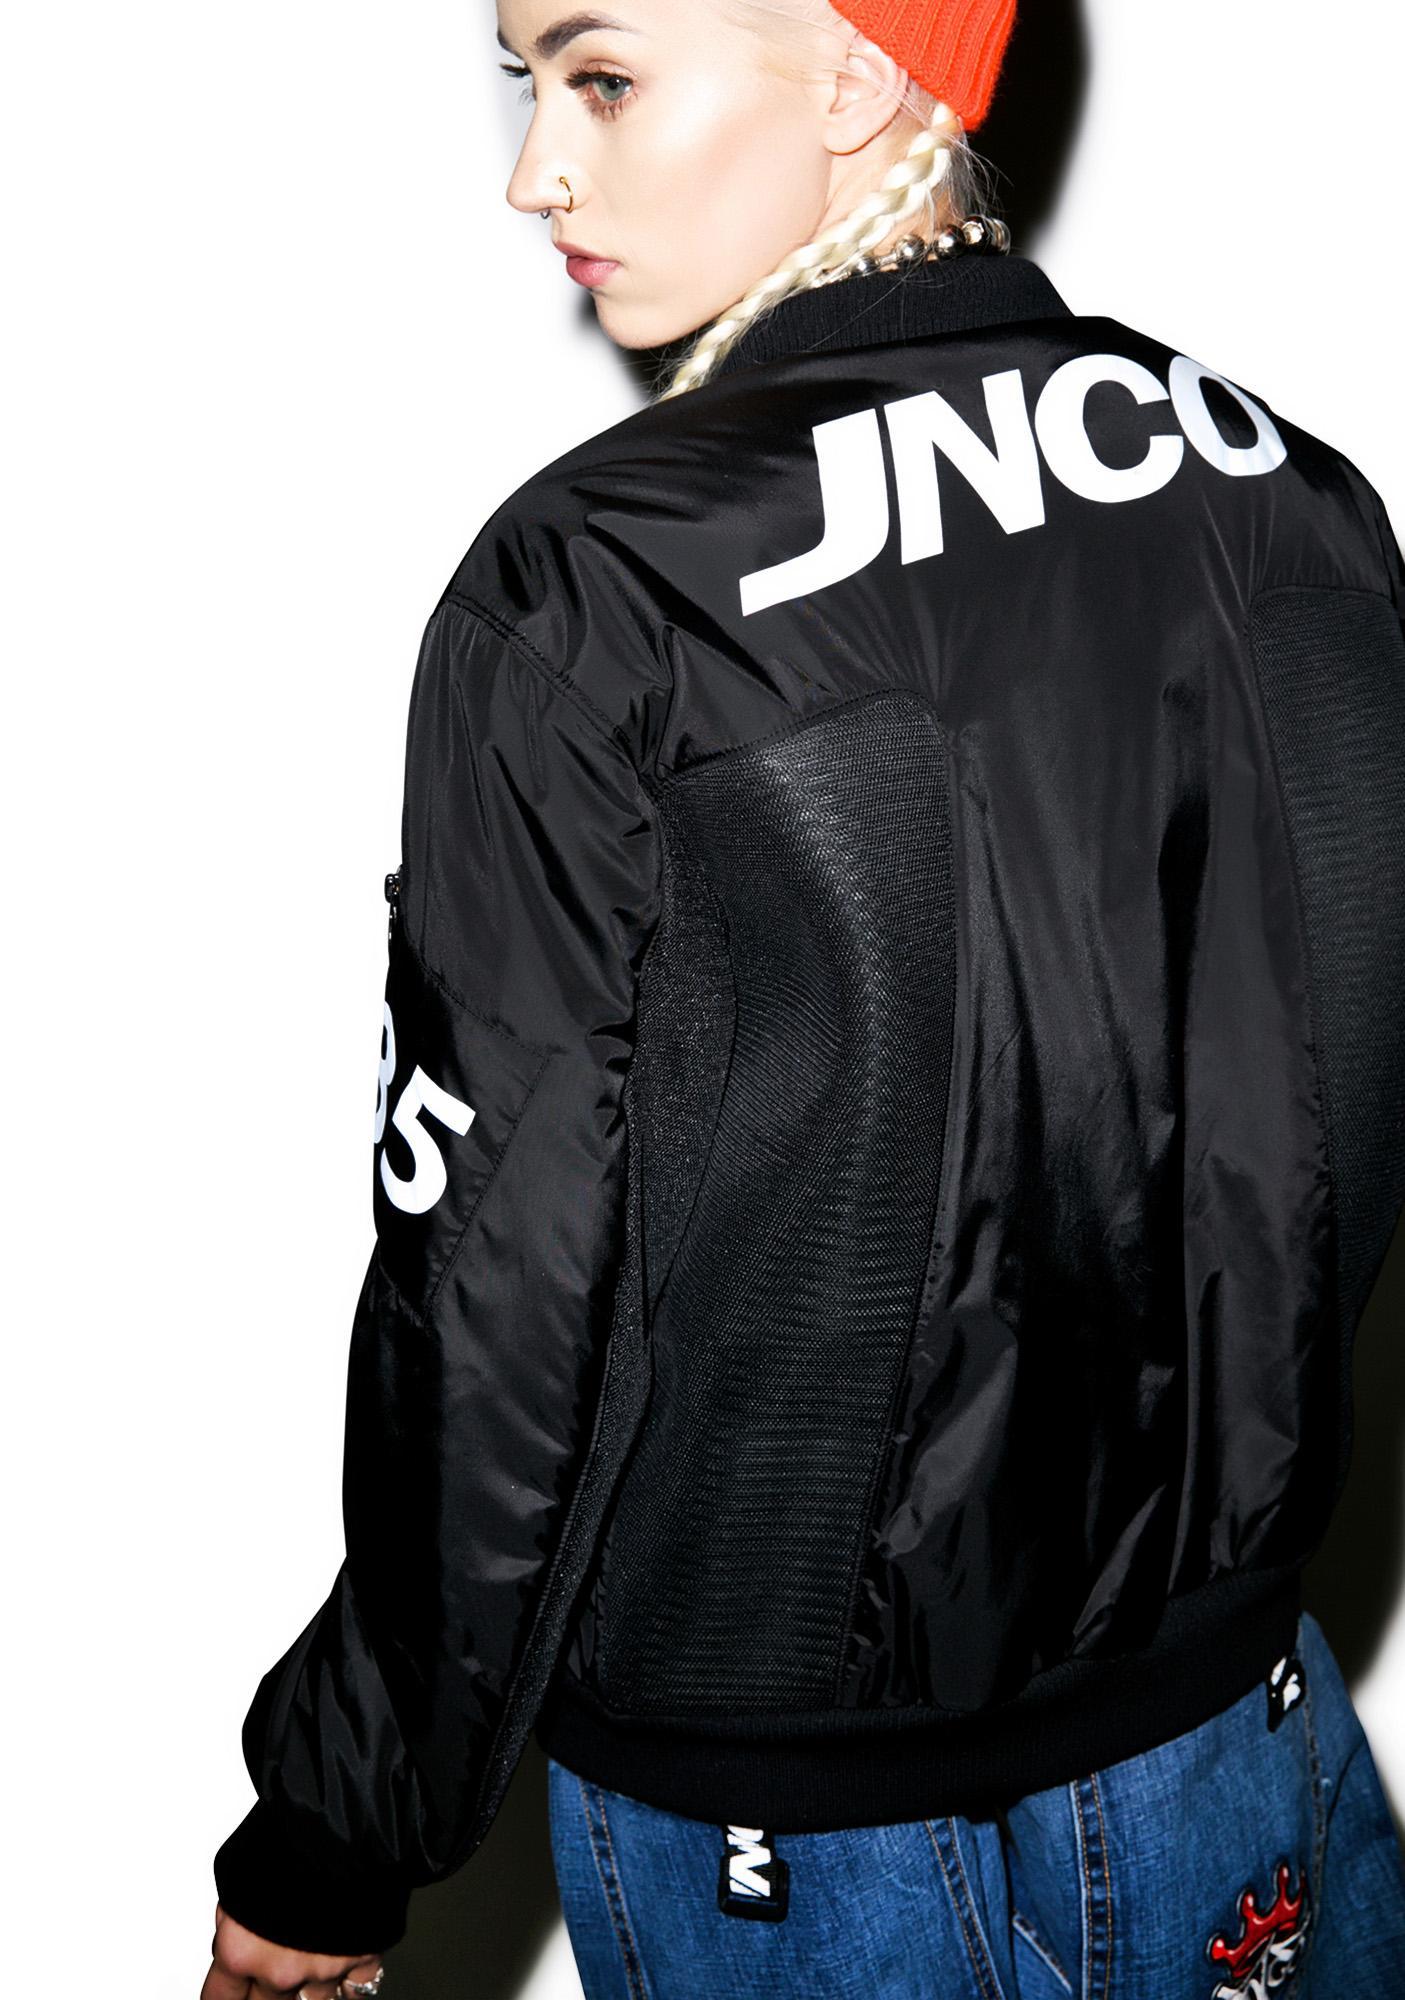 JNCO Phantom MA-1 Logo Bomber Jacket